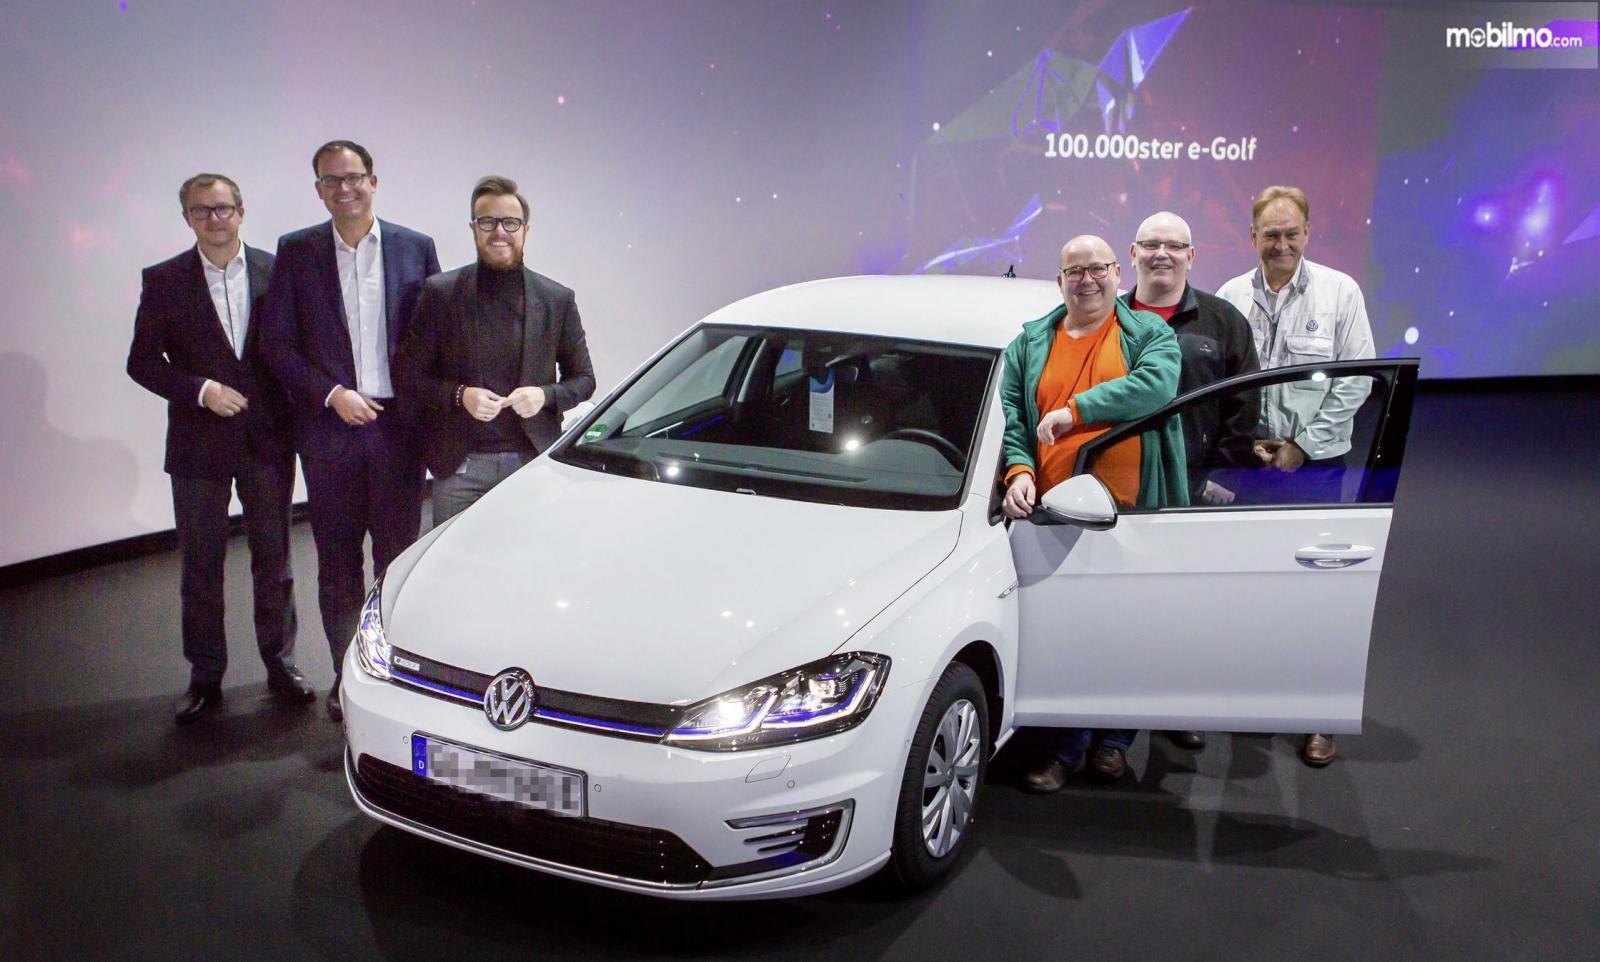 Foto penyerahan unit ke 100.000 VW e-Golf kepada konsumen